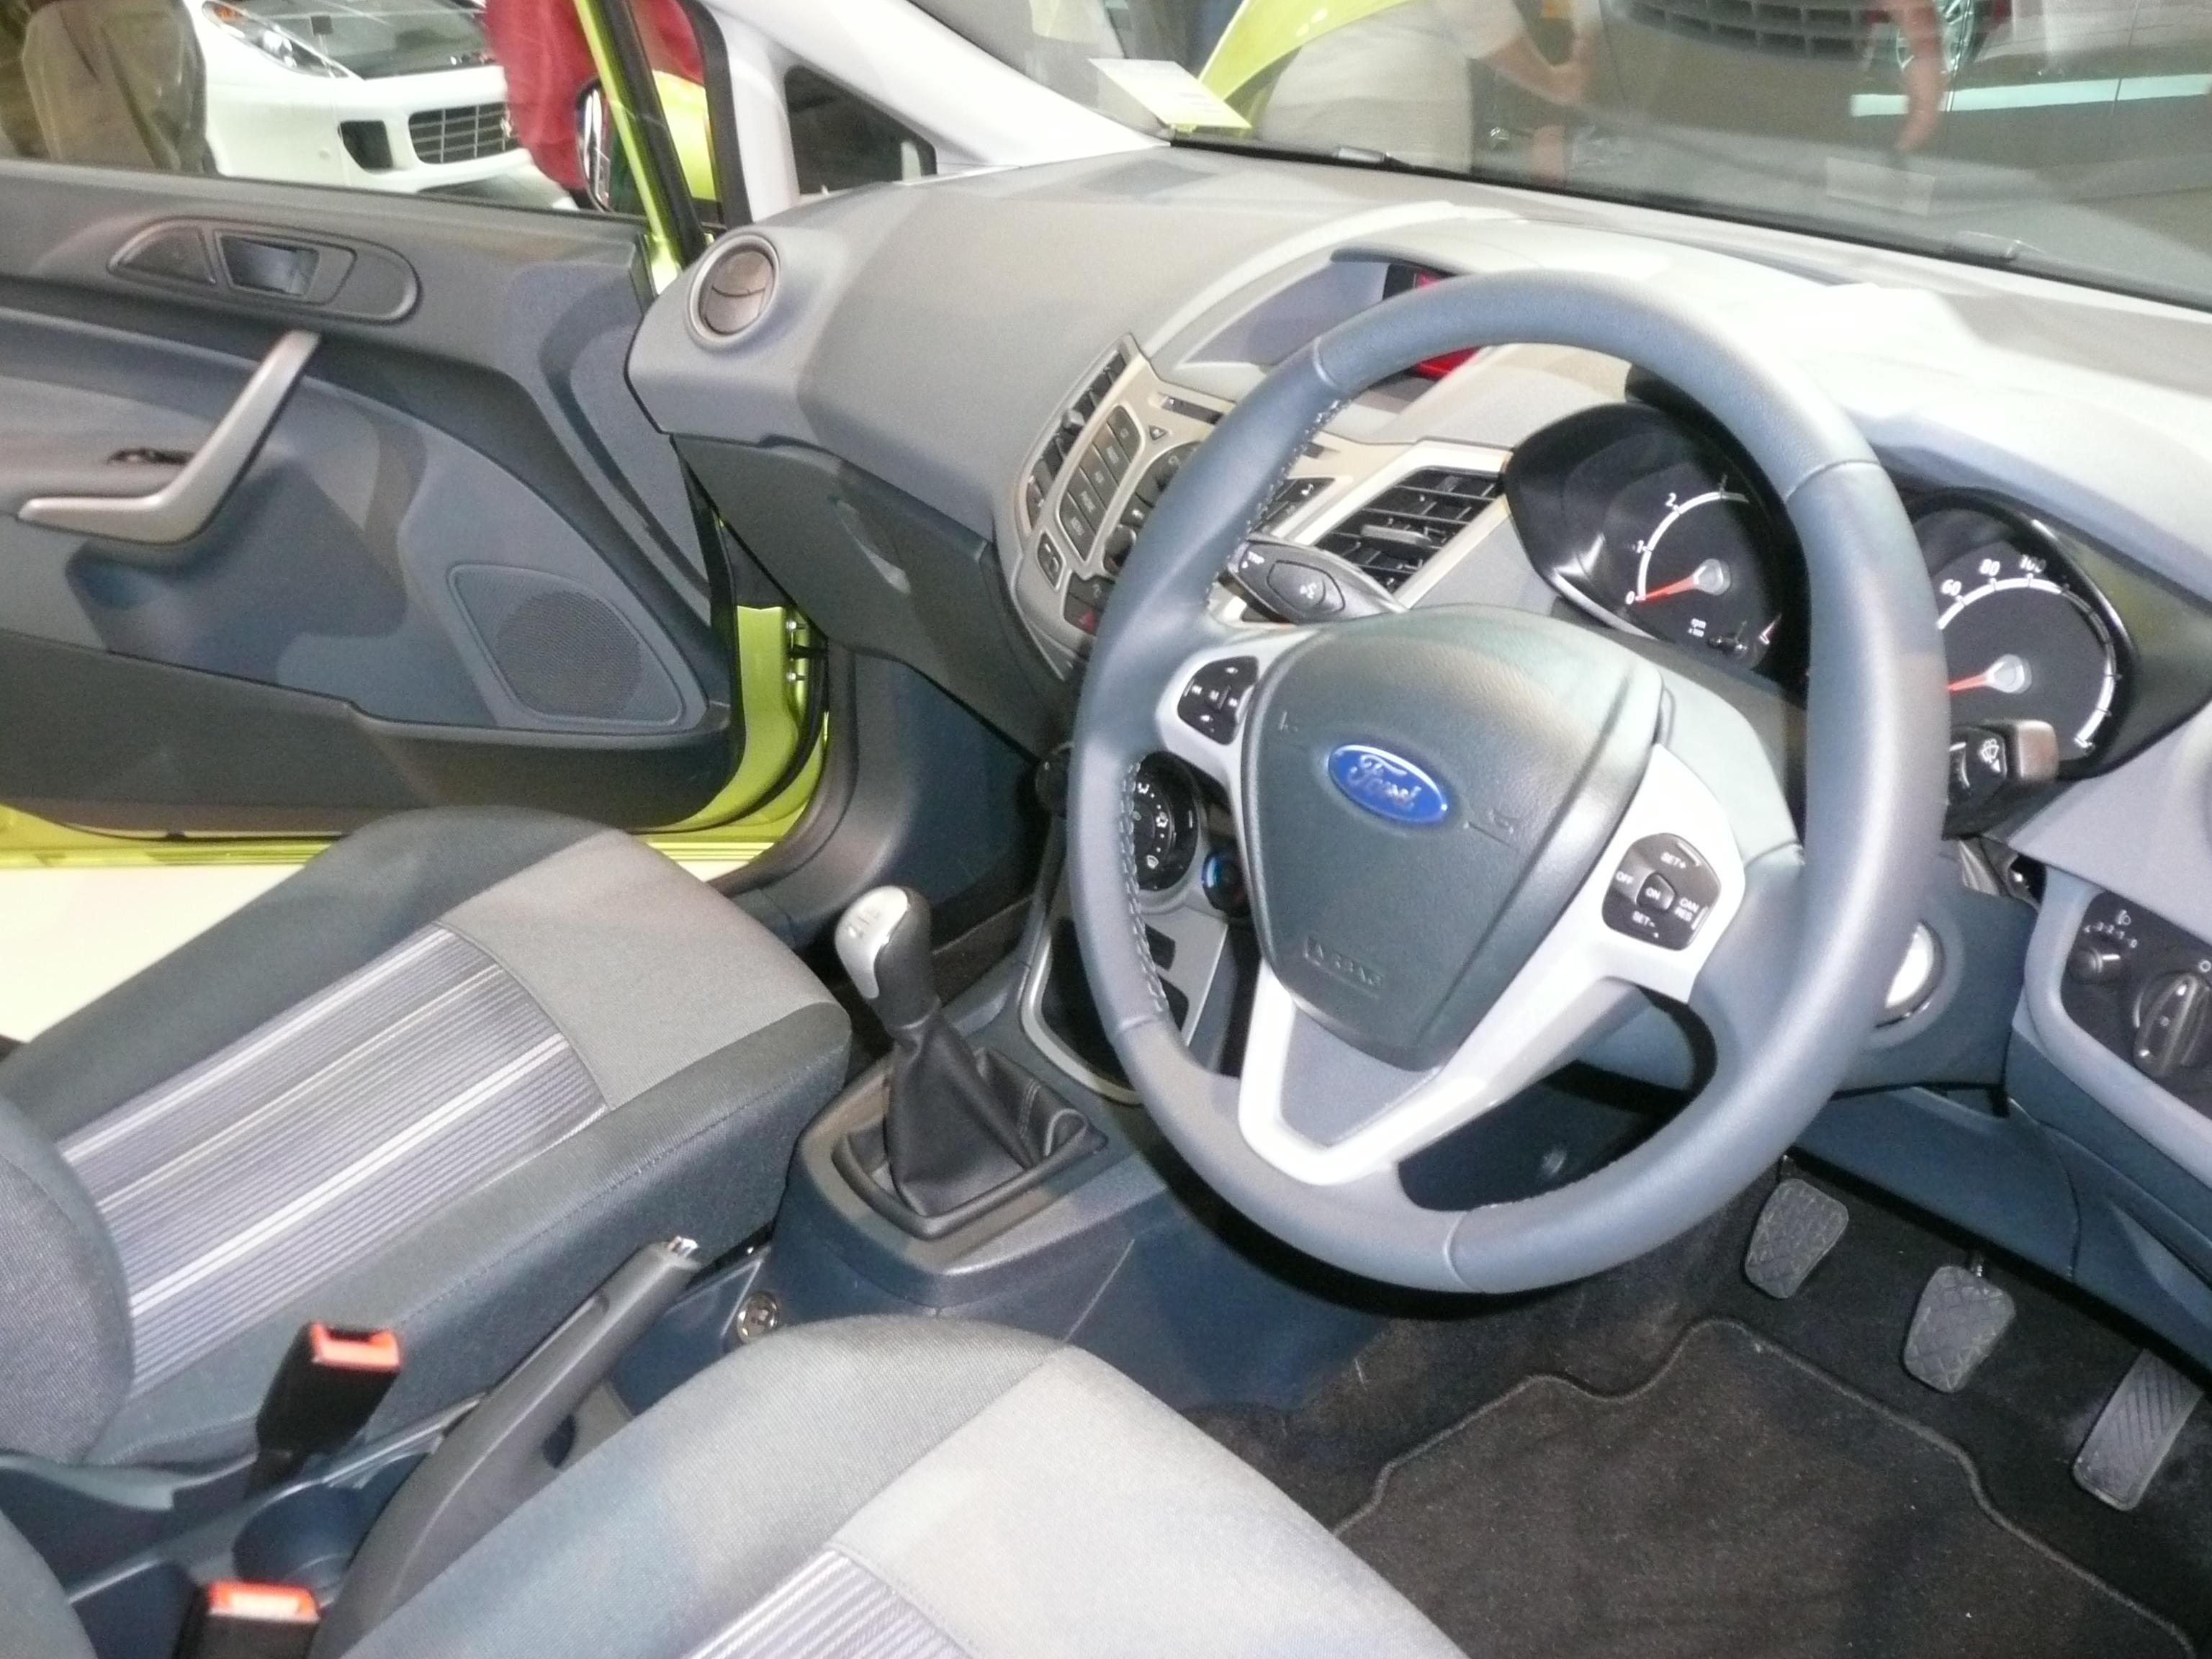 File:2008 Ford Fiesta (WS) LX 5-door hatchback 02.jpg & File:2008 Ford Fiesta (WS) LX 5-door hatchback 02.jpg - Wikimedia ... Pezcame.Com